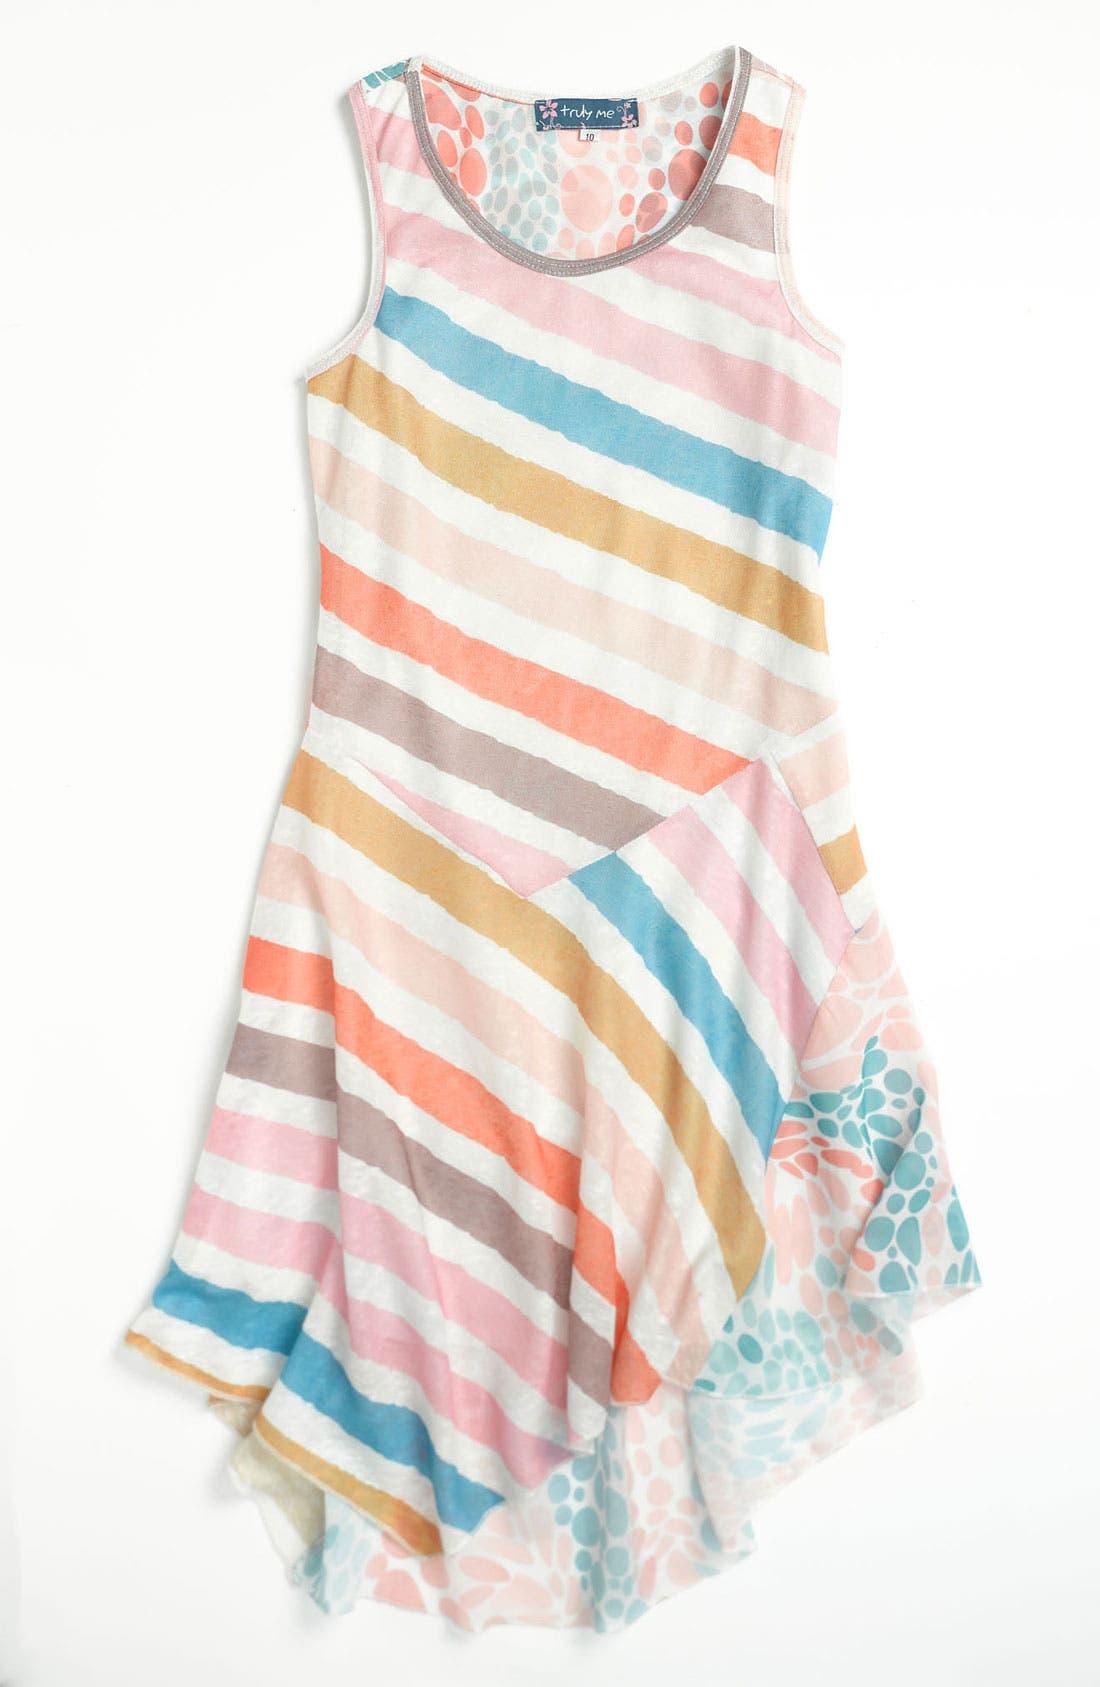 Main Image - Truly Me Mixed Print Dress (Little Girls & Big Girls)